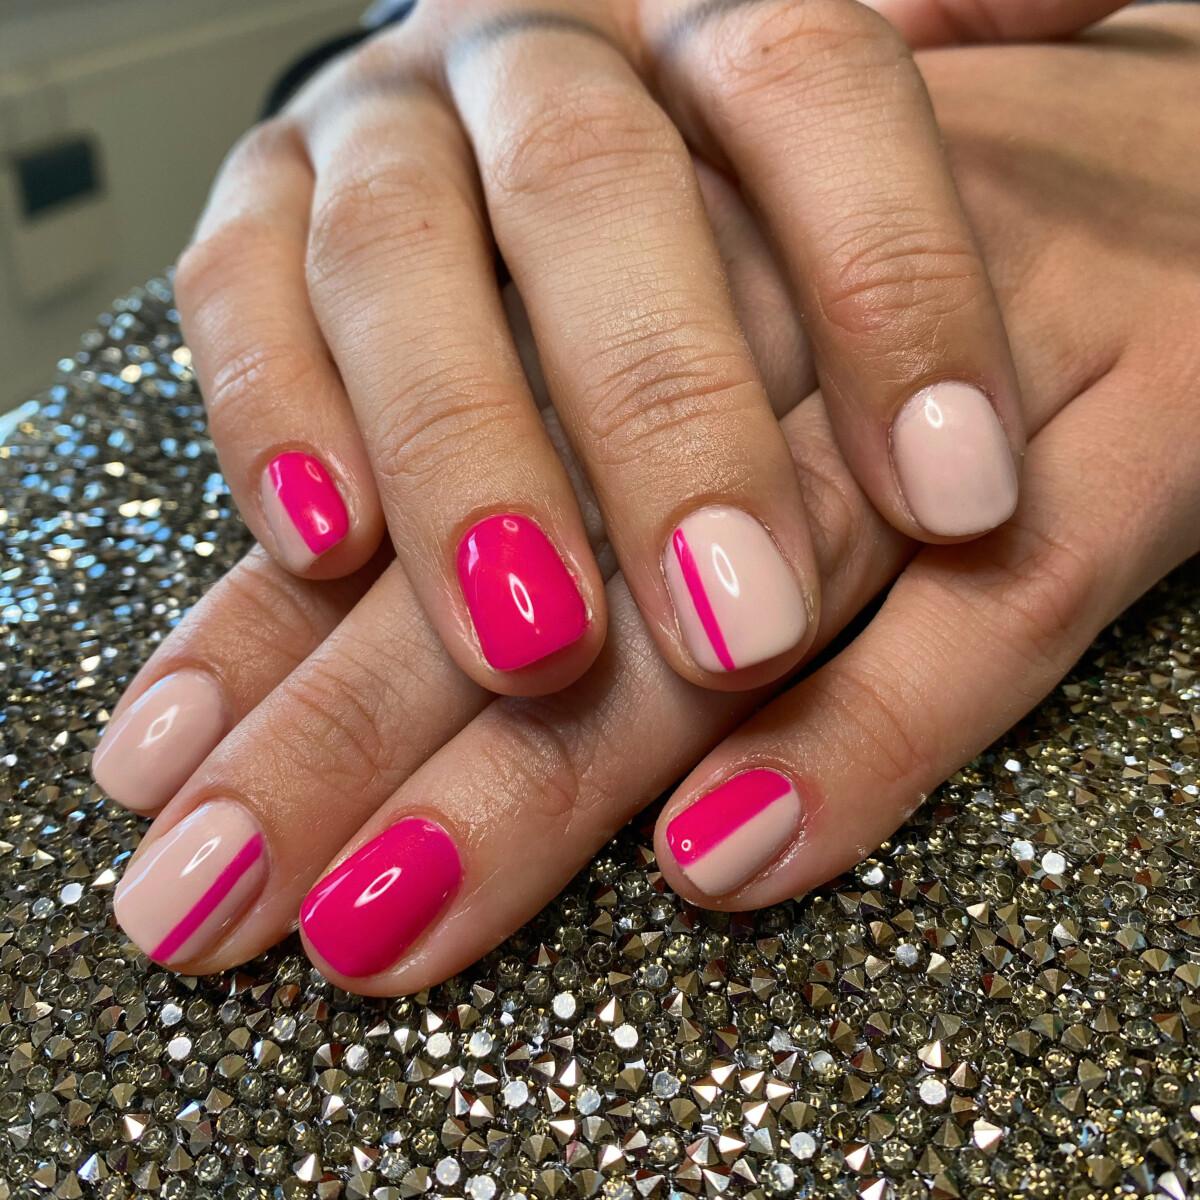 Manicure extra + nail art minimalistic